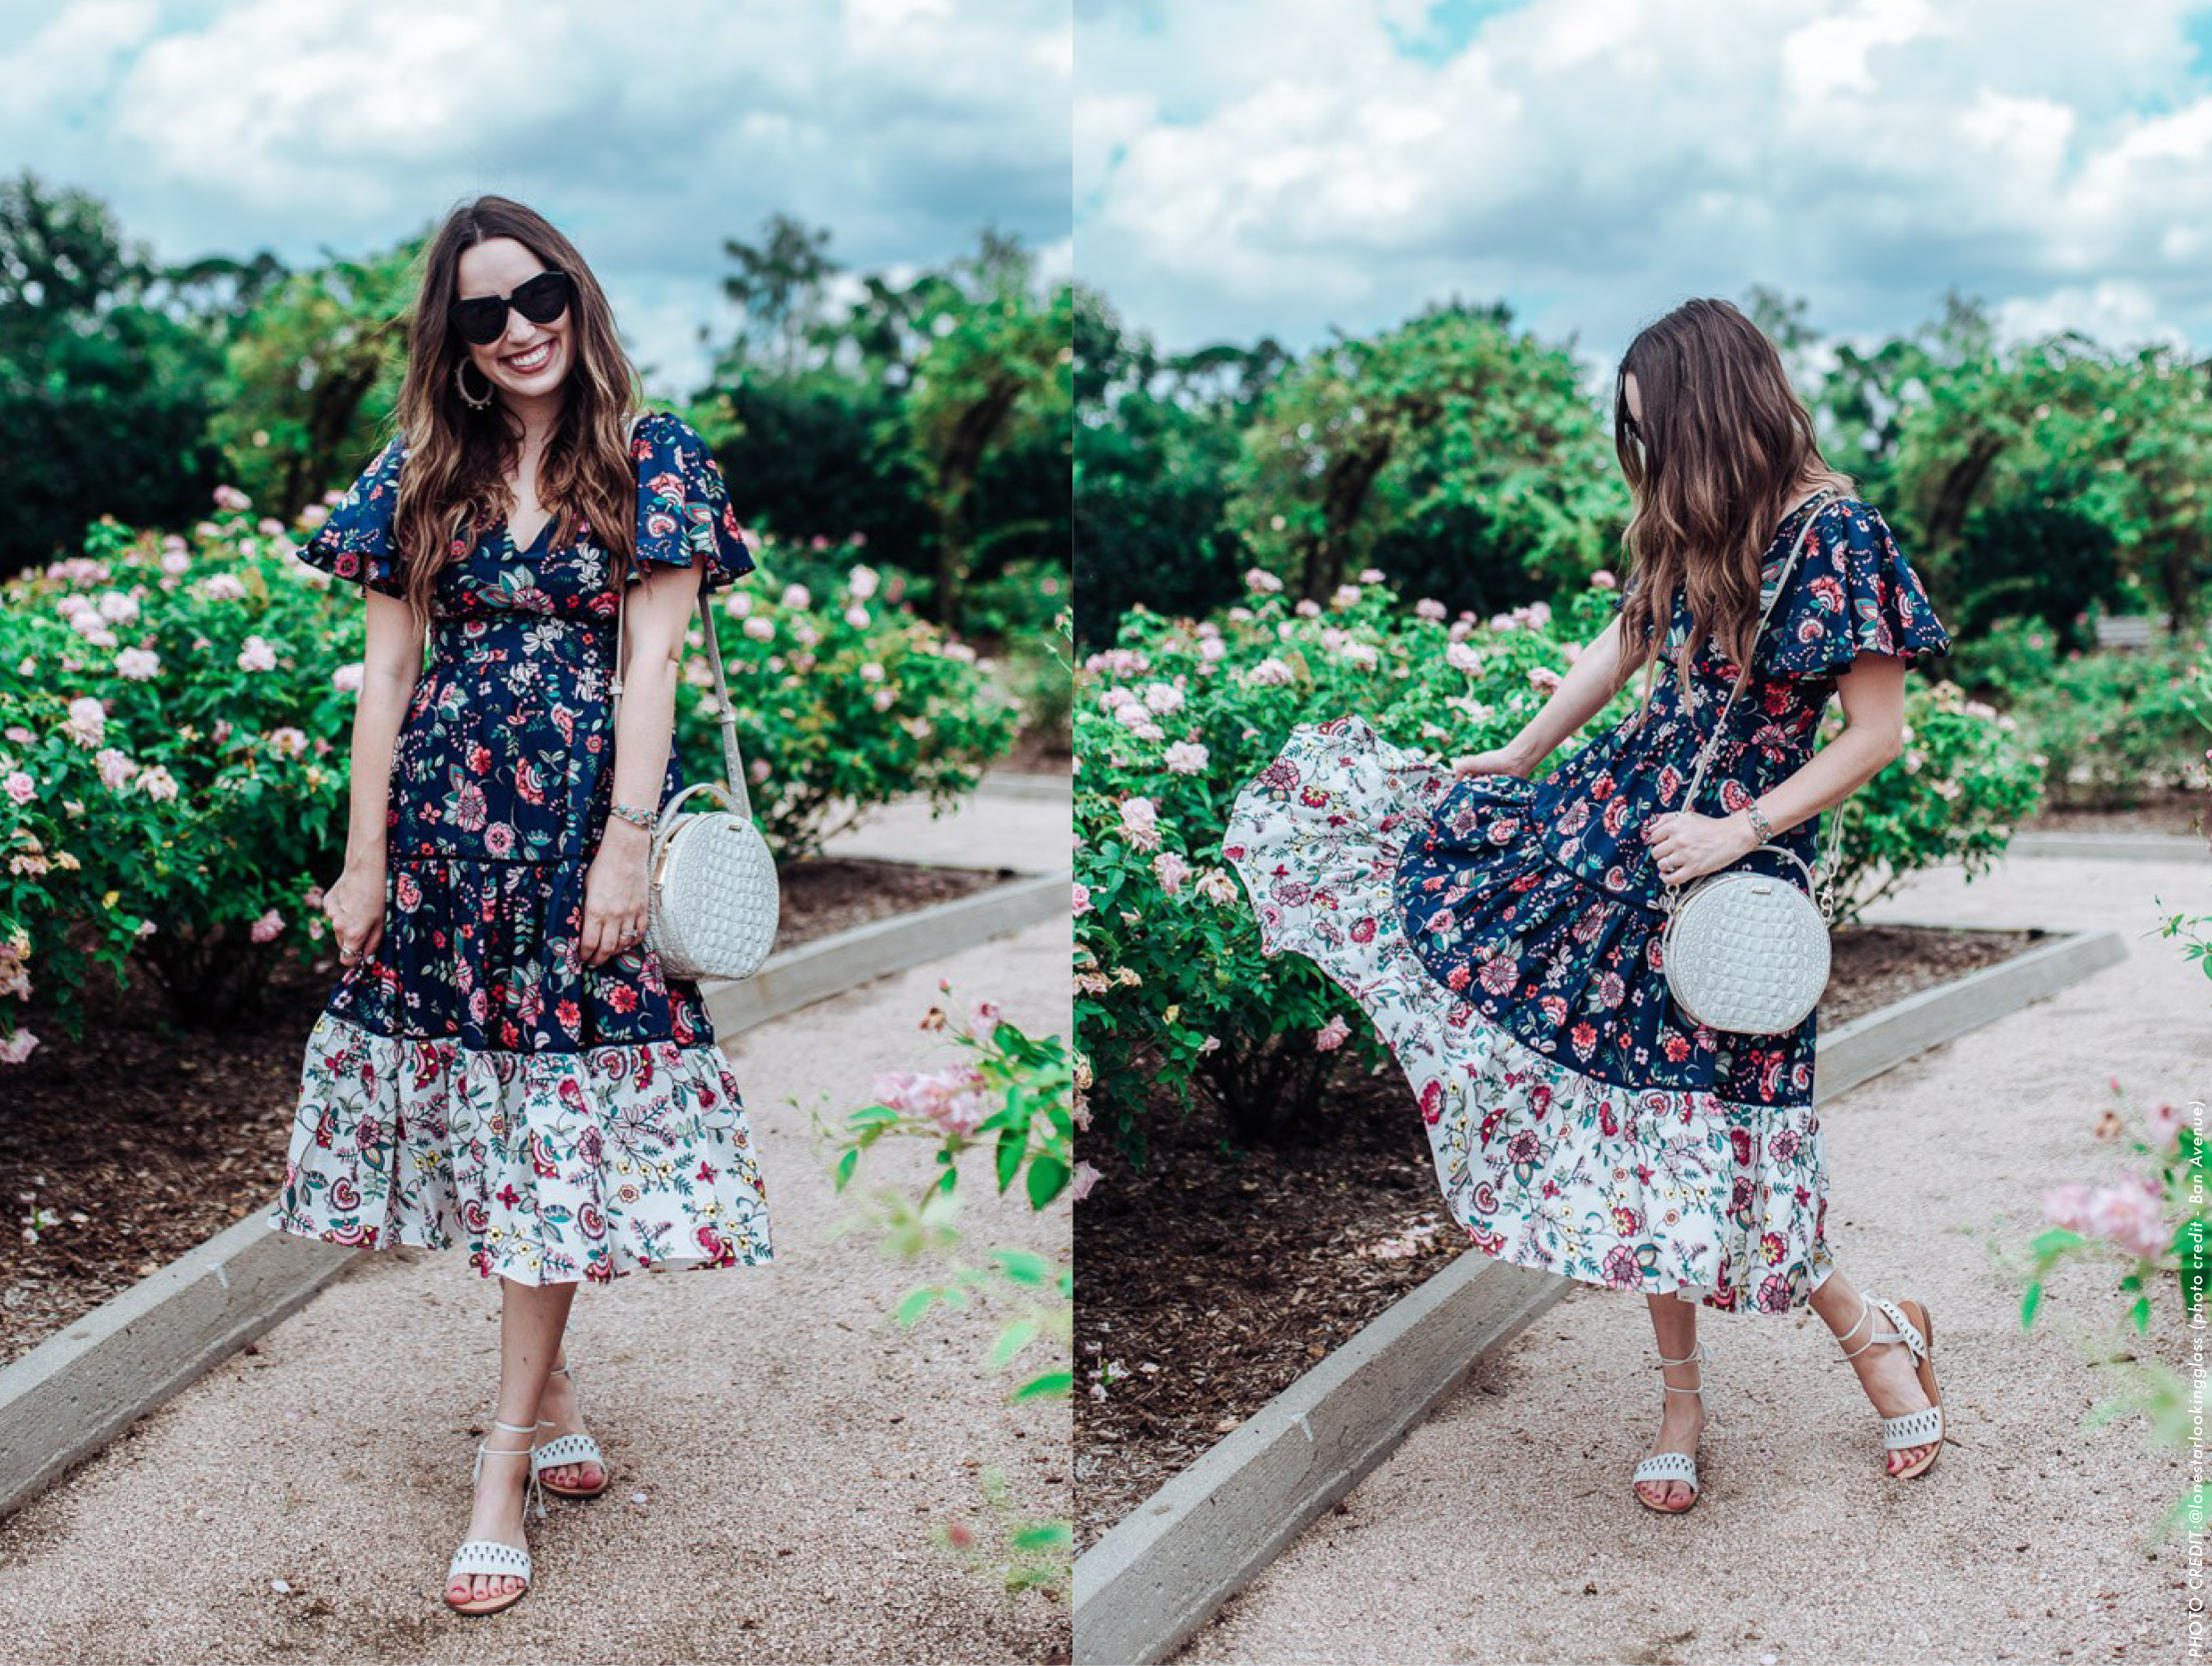 BROWN_TAYLOR_RECENT WORK- ELIZAJ DRESS-faggotting floral2.jpg